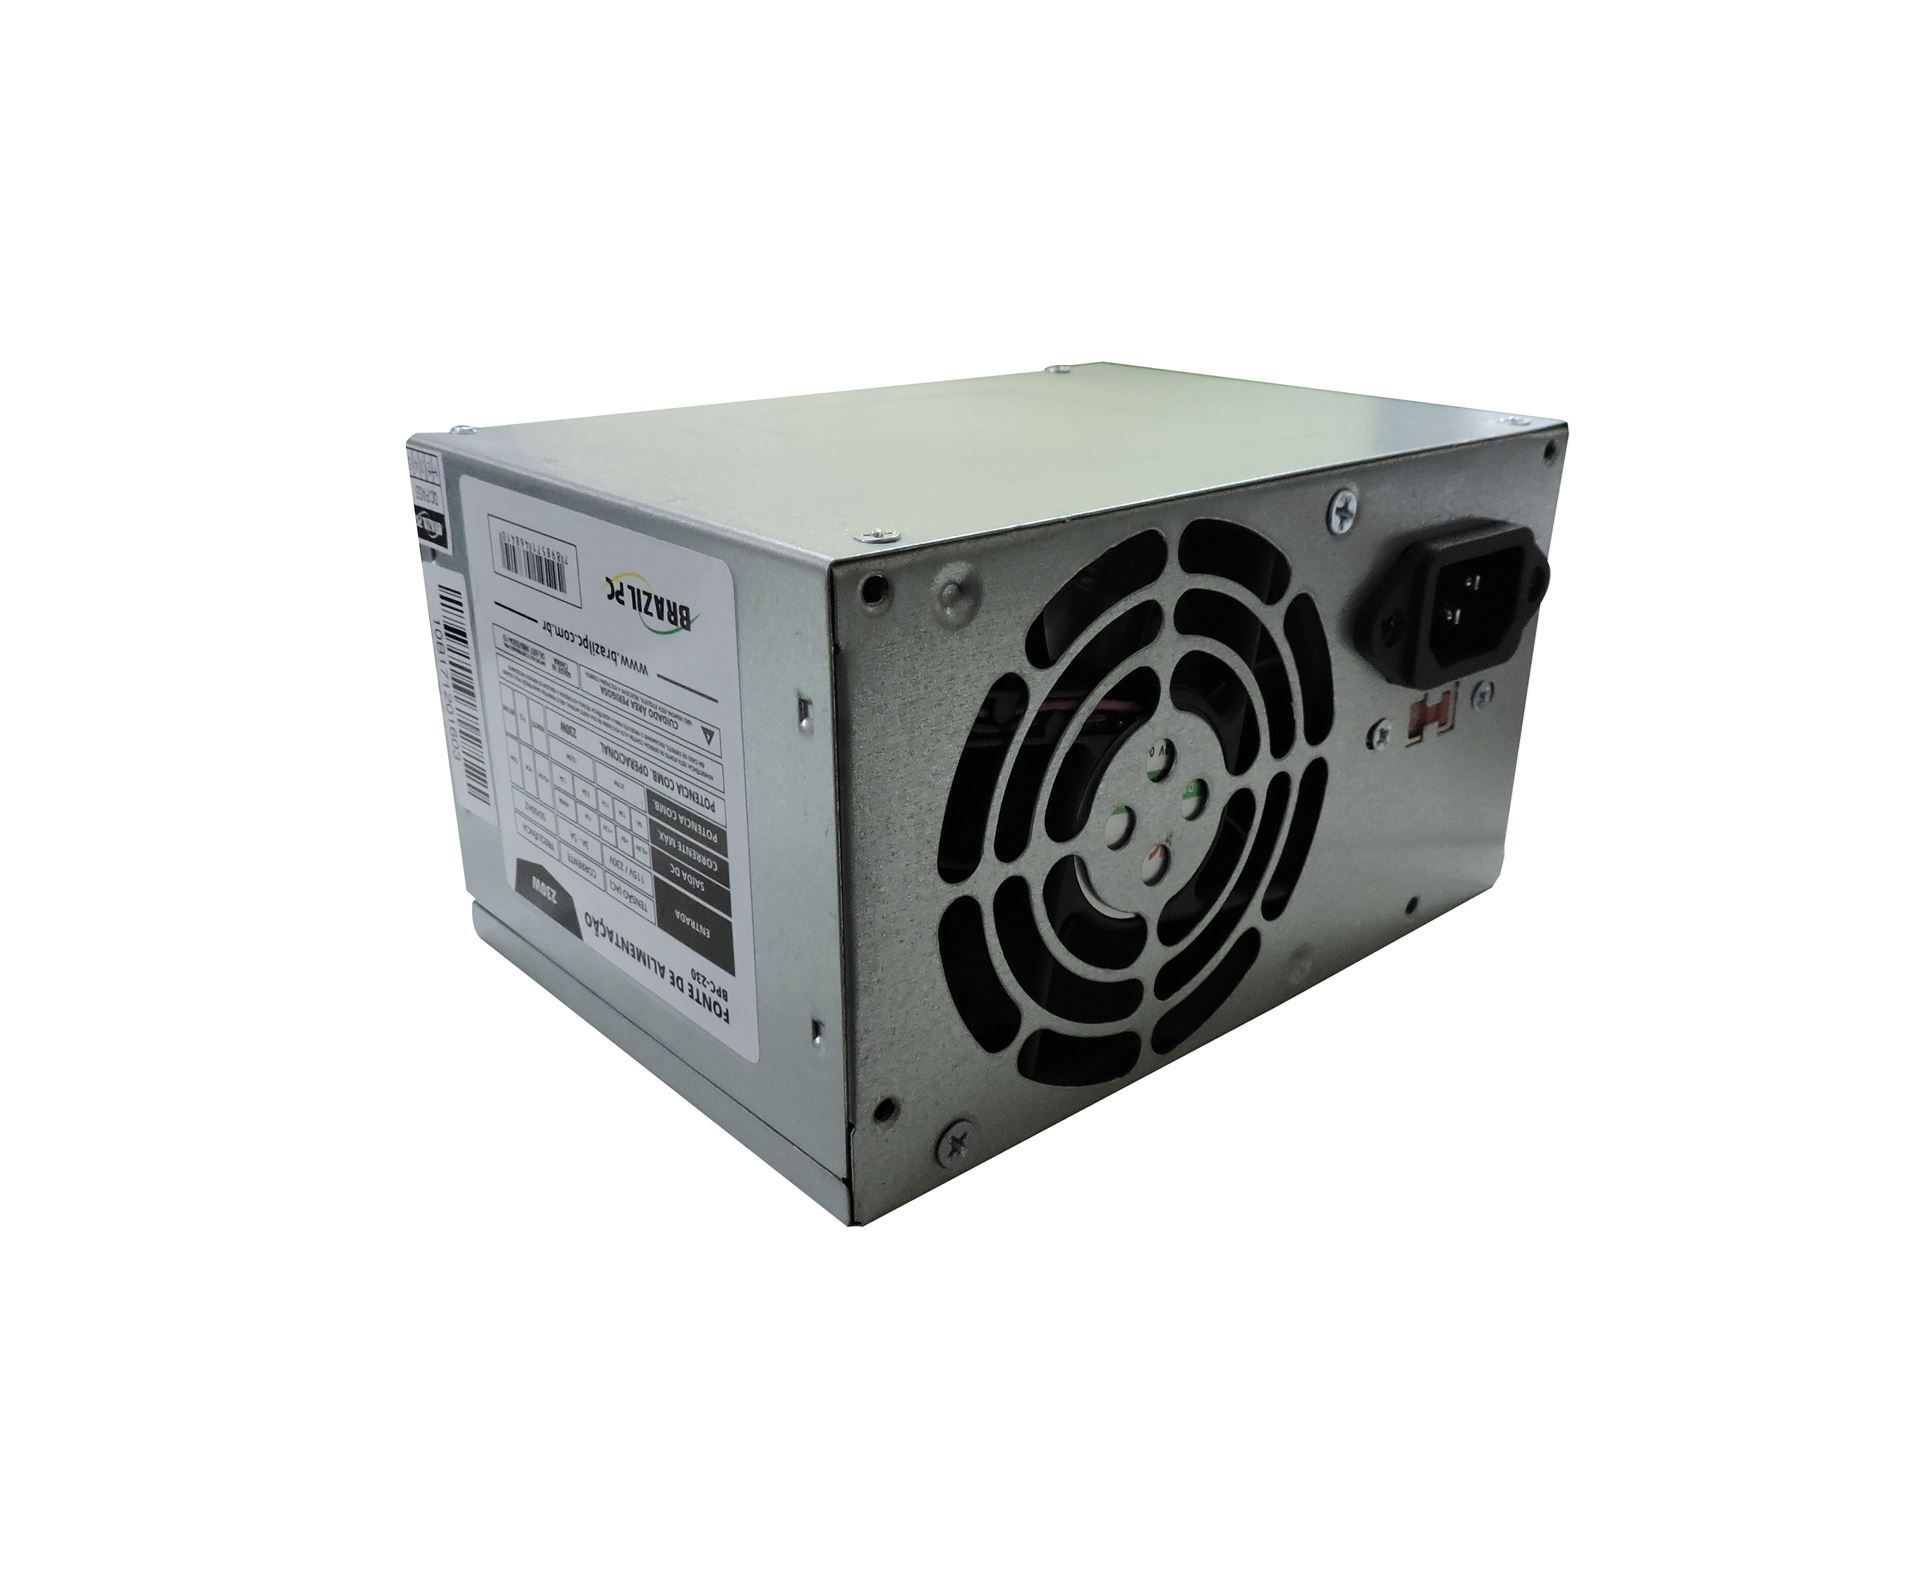 FONTE ATX 230W REAL BRAZILPC BPC-230 24 PINOS/2x Sata/2x IDE  - Mega Computadores